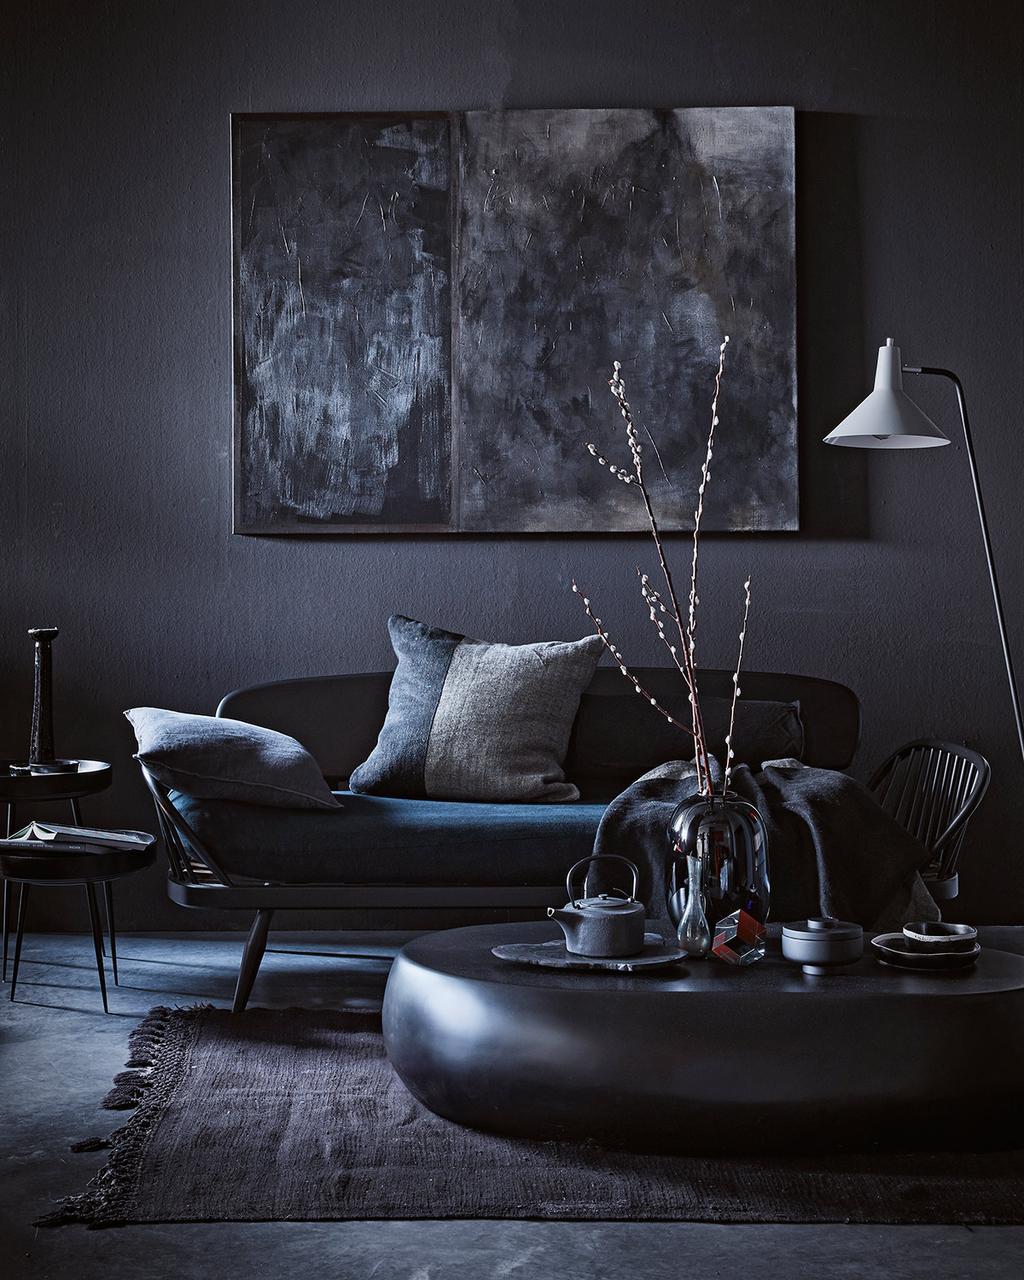 Zwart interieur: warmte in de duisternis